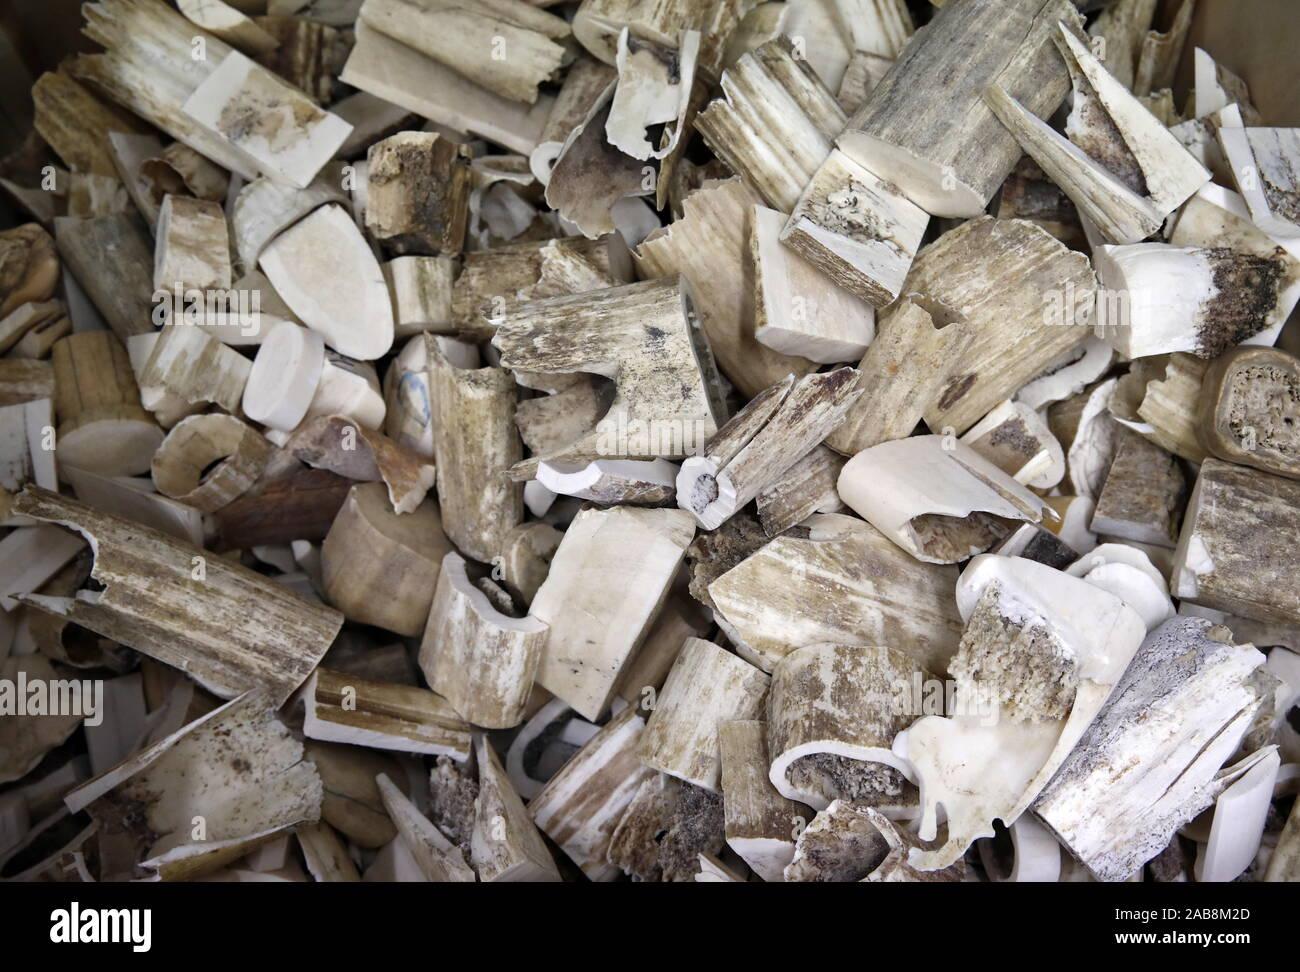 Anadyr Chukotka Russia November 22 2019 Blanks For Carving At A Bone Carving Art Studio At